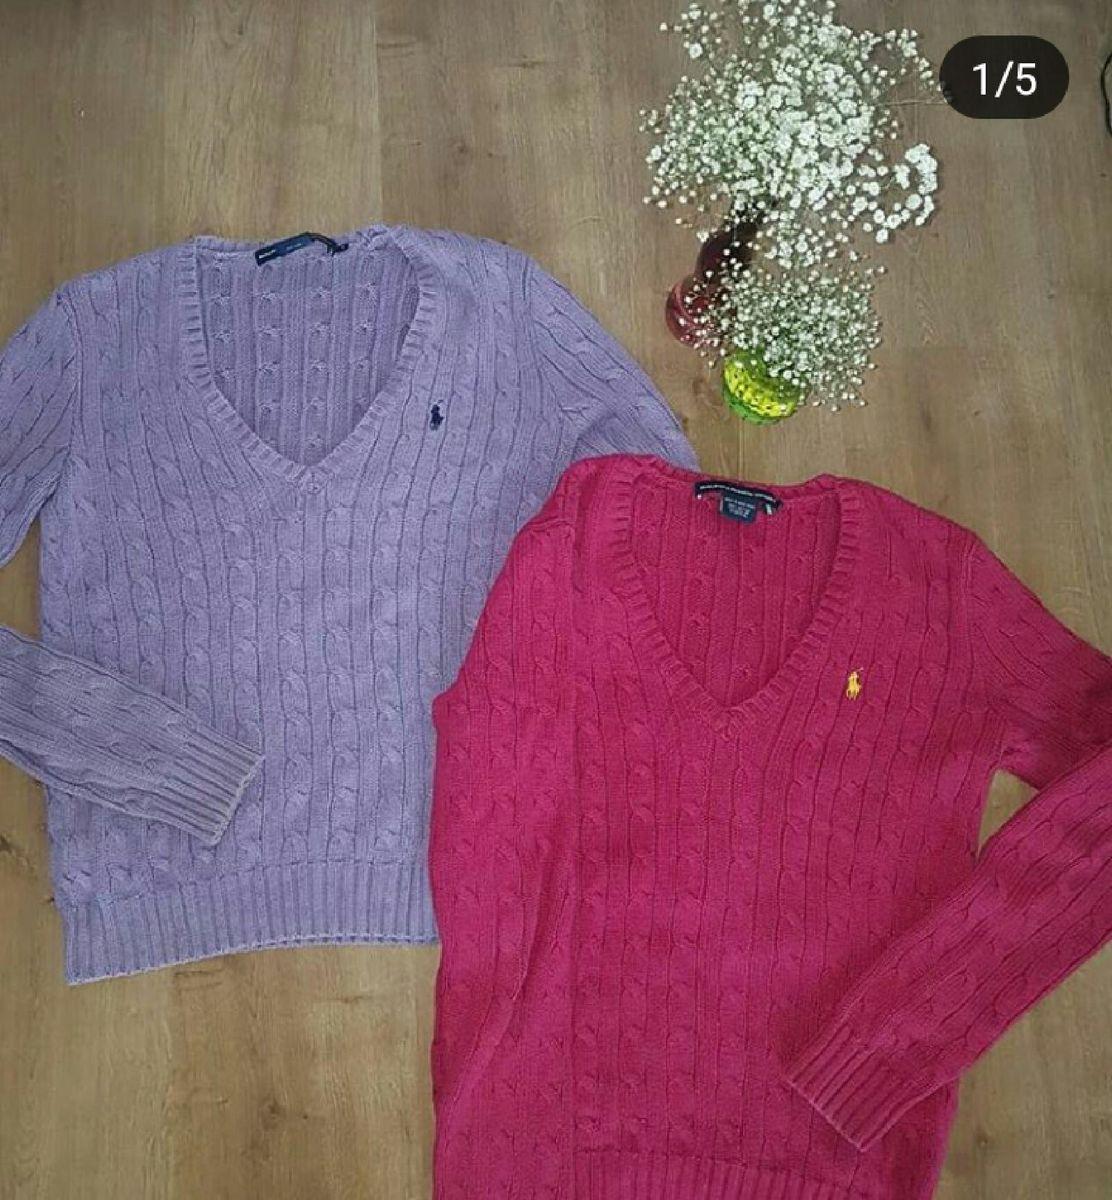 156bd2937c suéter polo ralph lauren roxo - casaquinhos polo ralph lauren